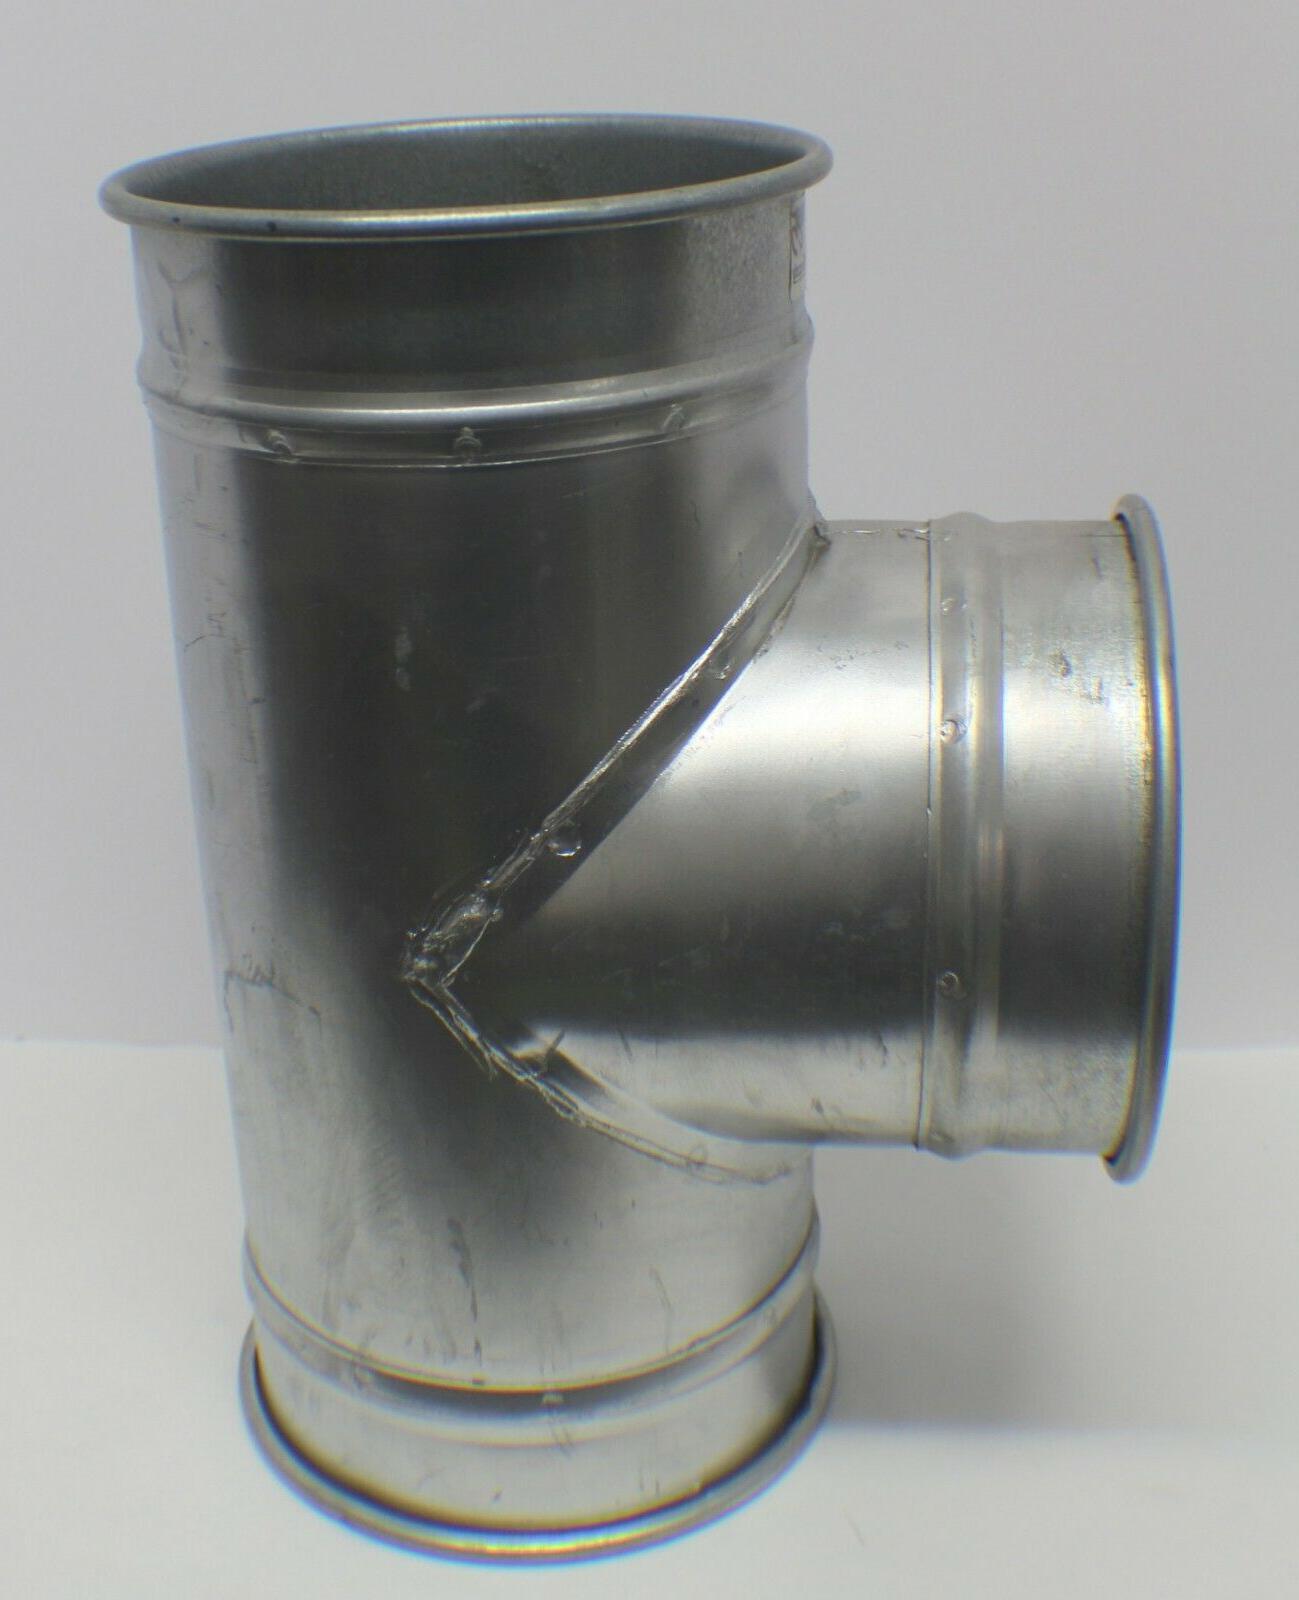 nordfab h8890 7 90 deg industrial dust